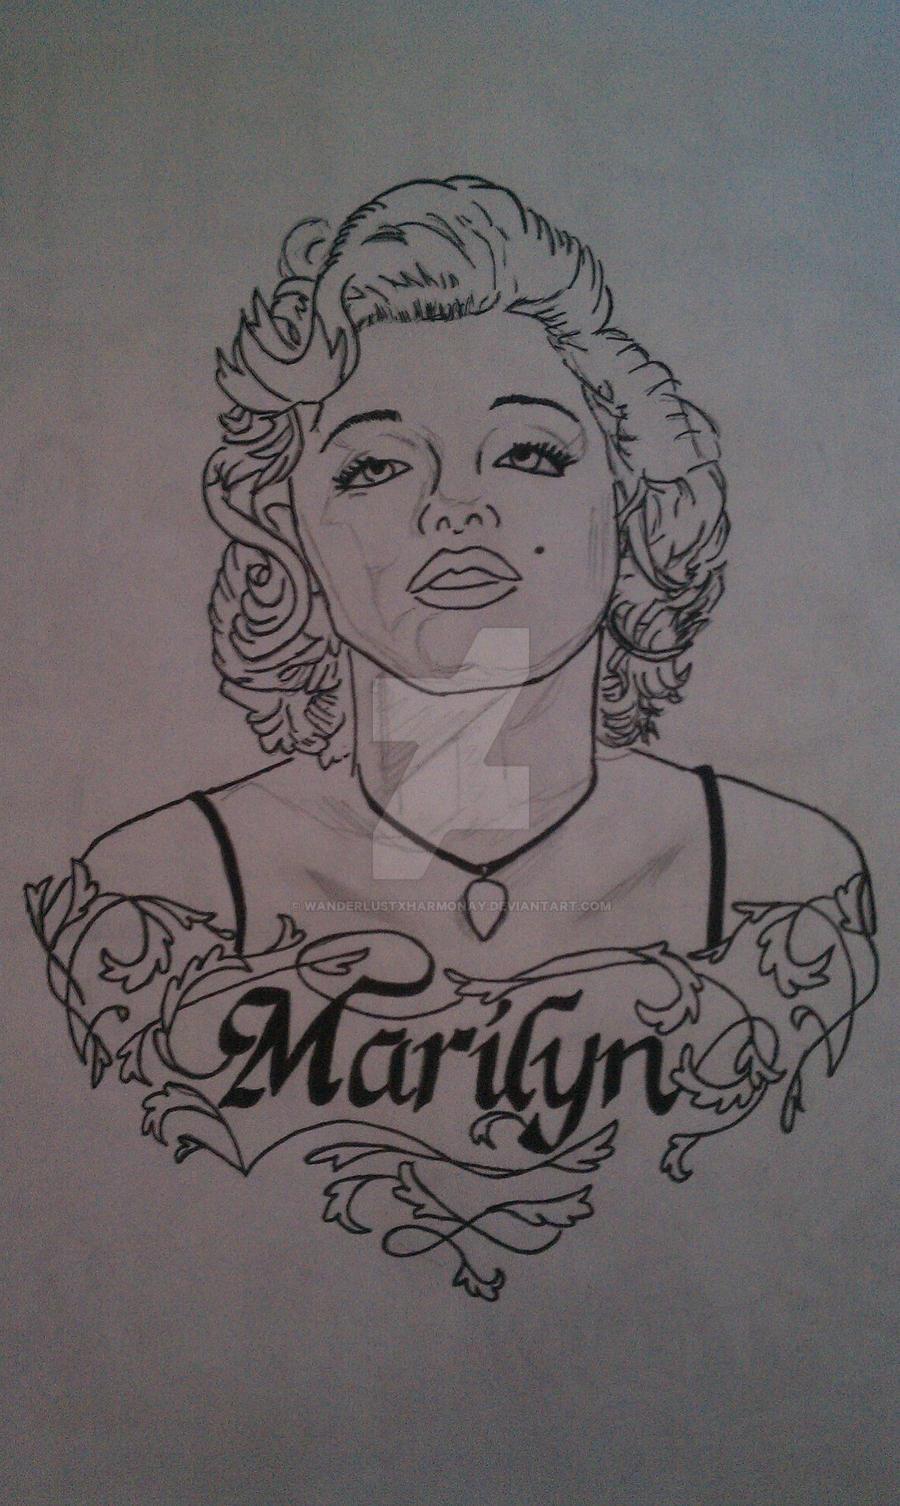 Marilyn monroe tattoo wip by wanderlustxharmonay on deviantart for Marilyn monroe with tattoos poster